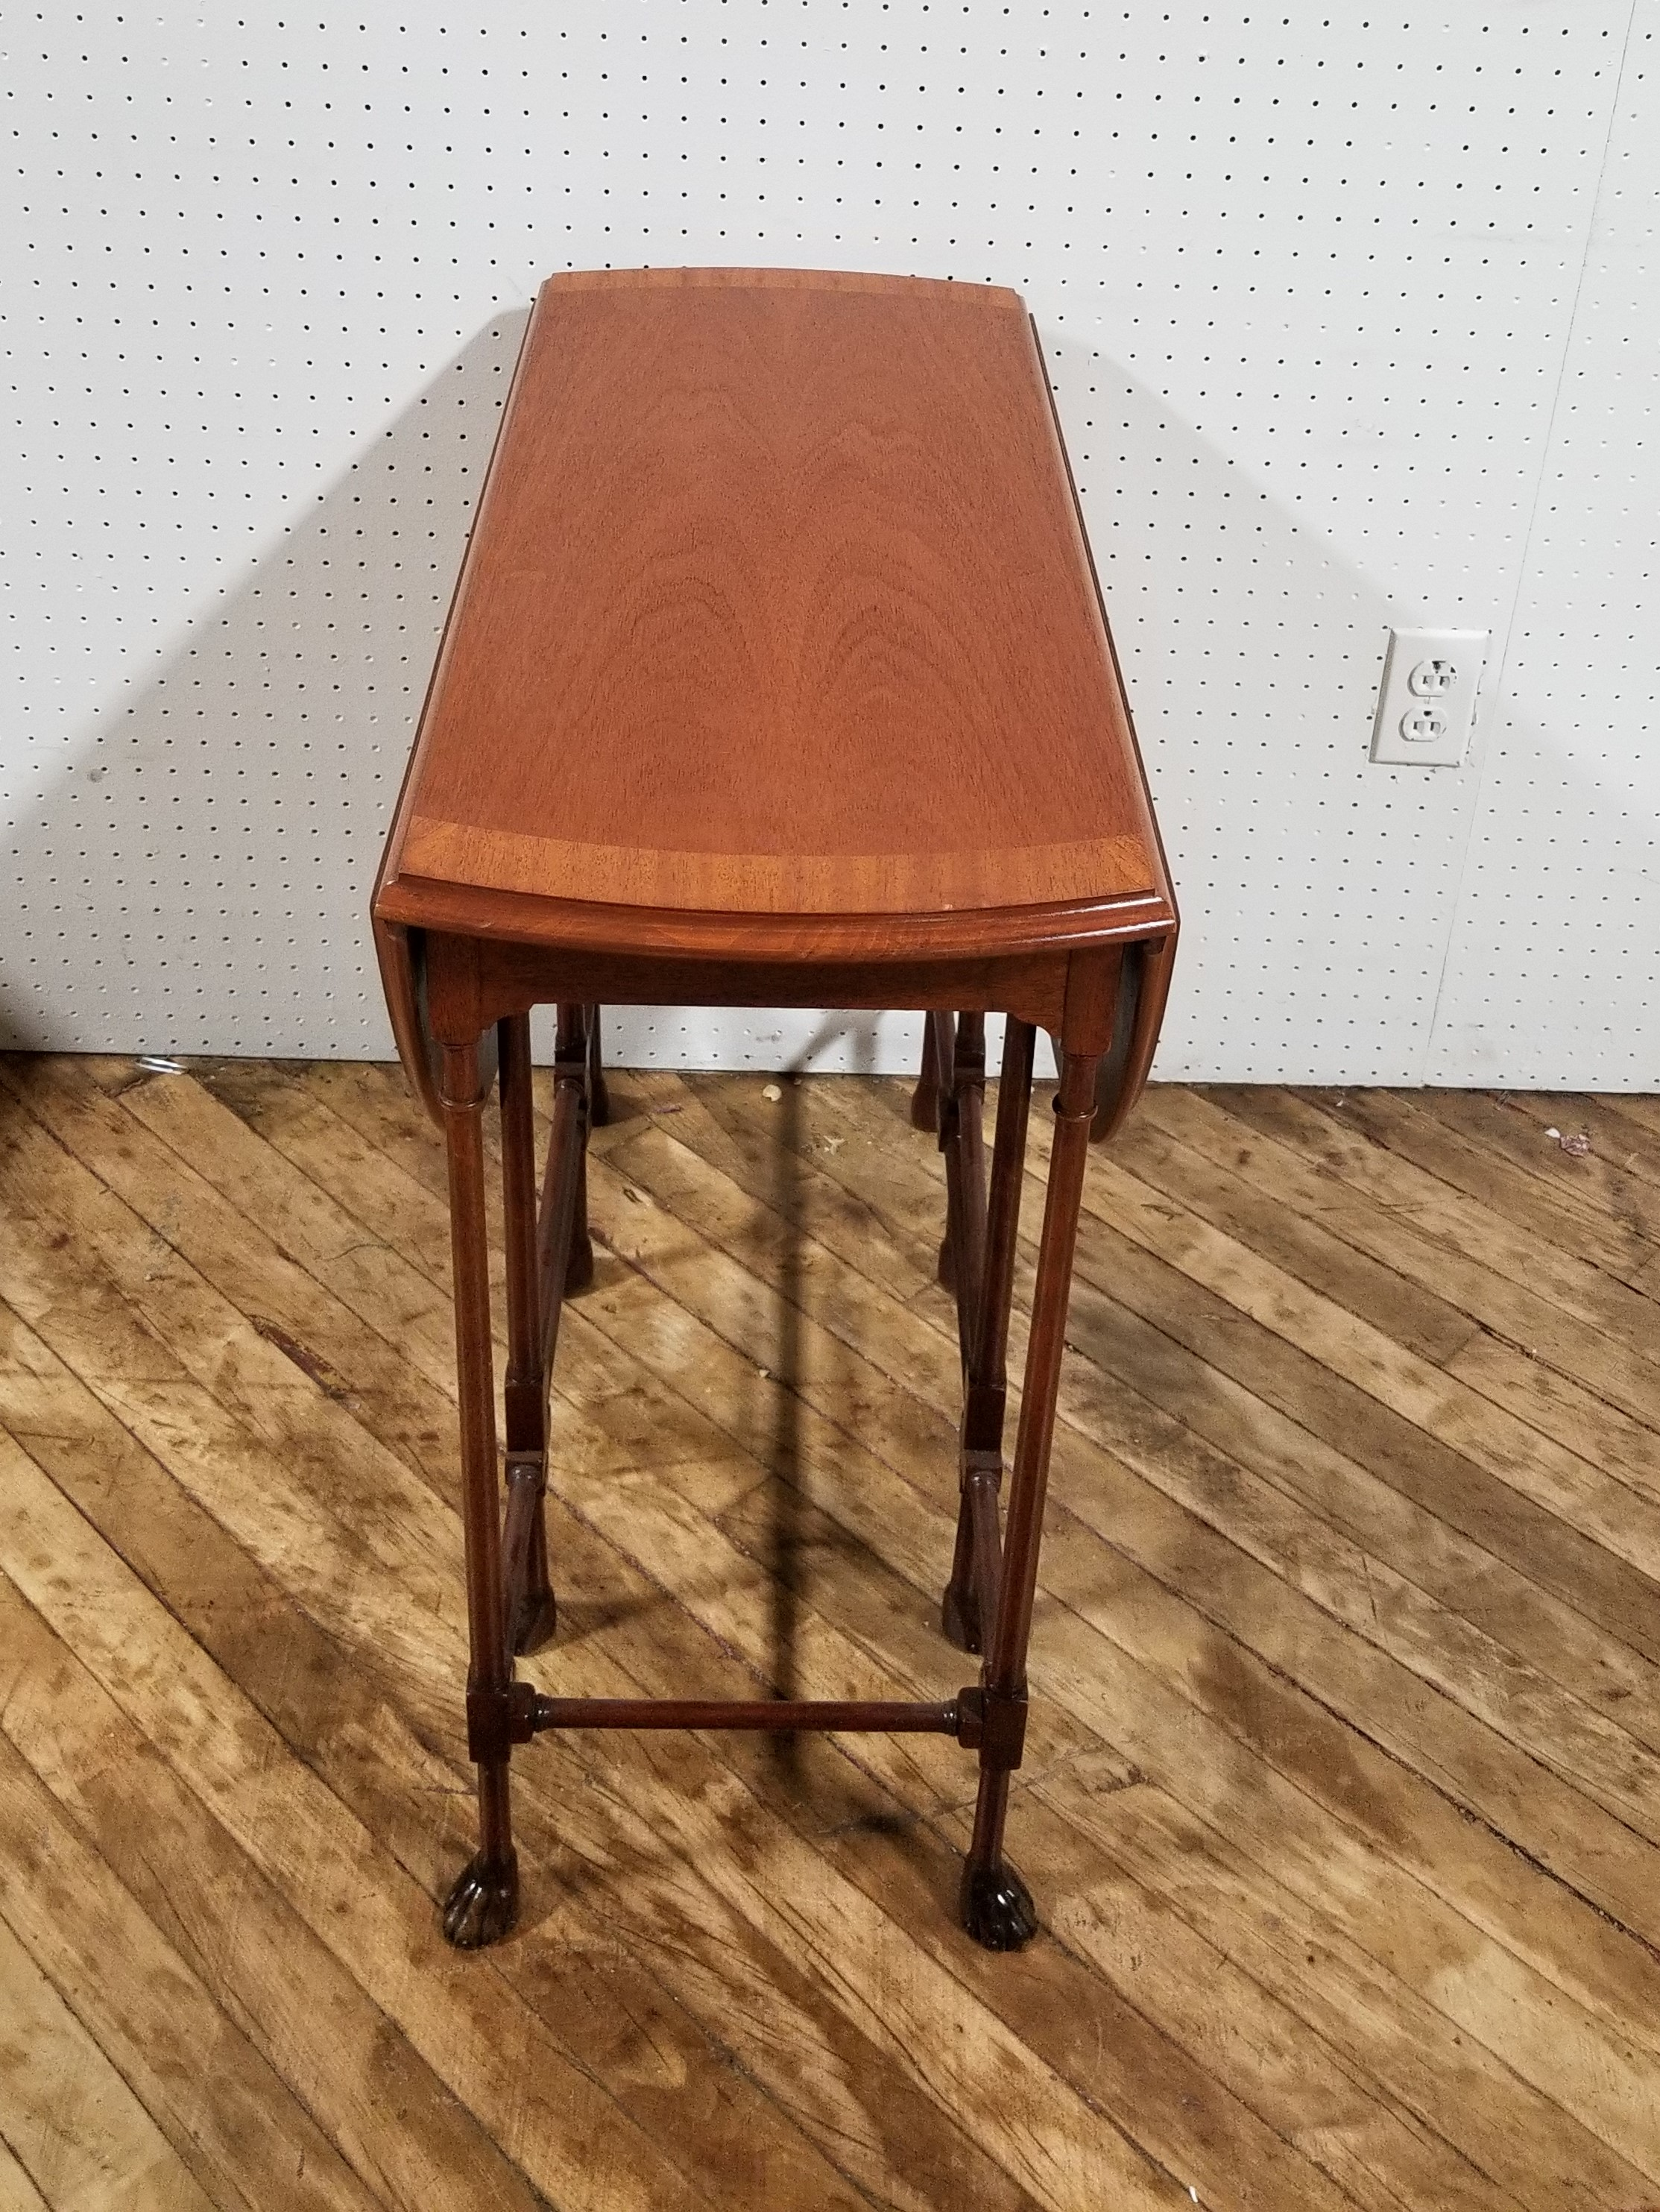 #305A. Folding Table